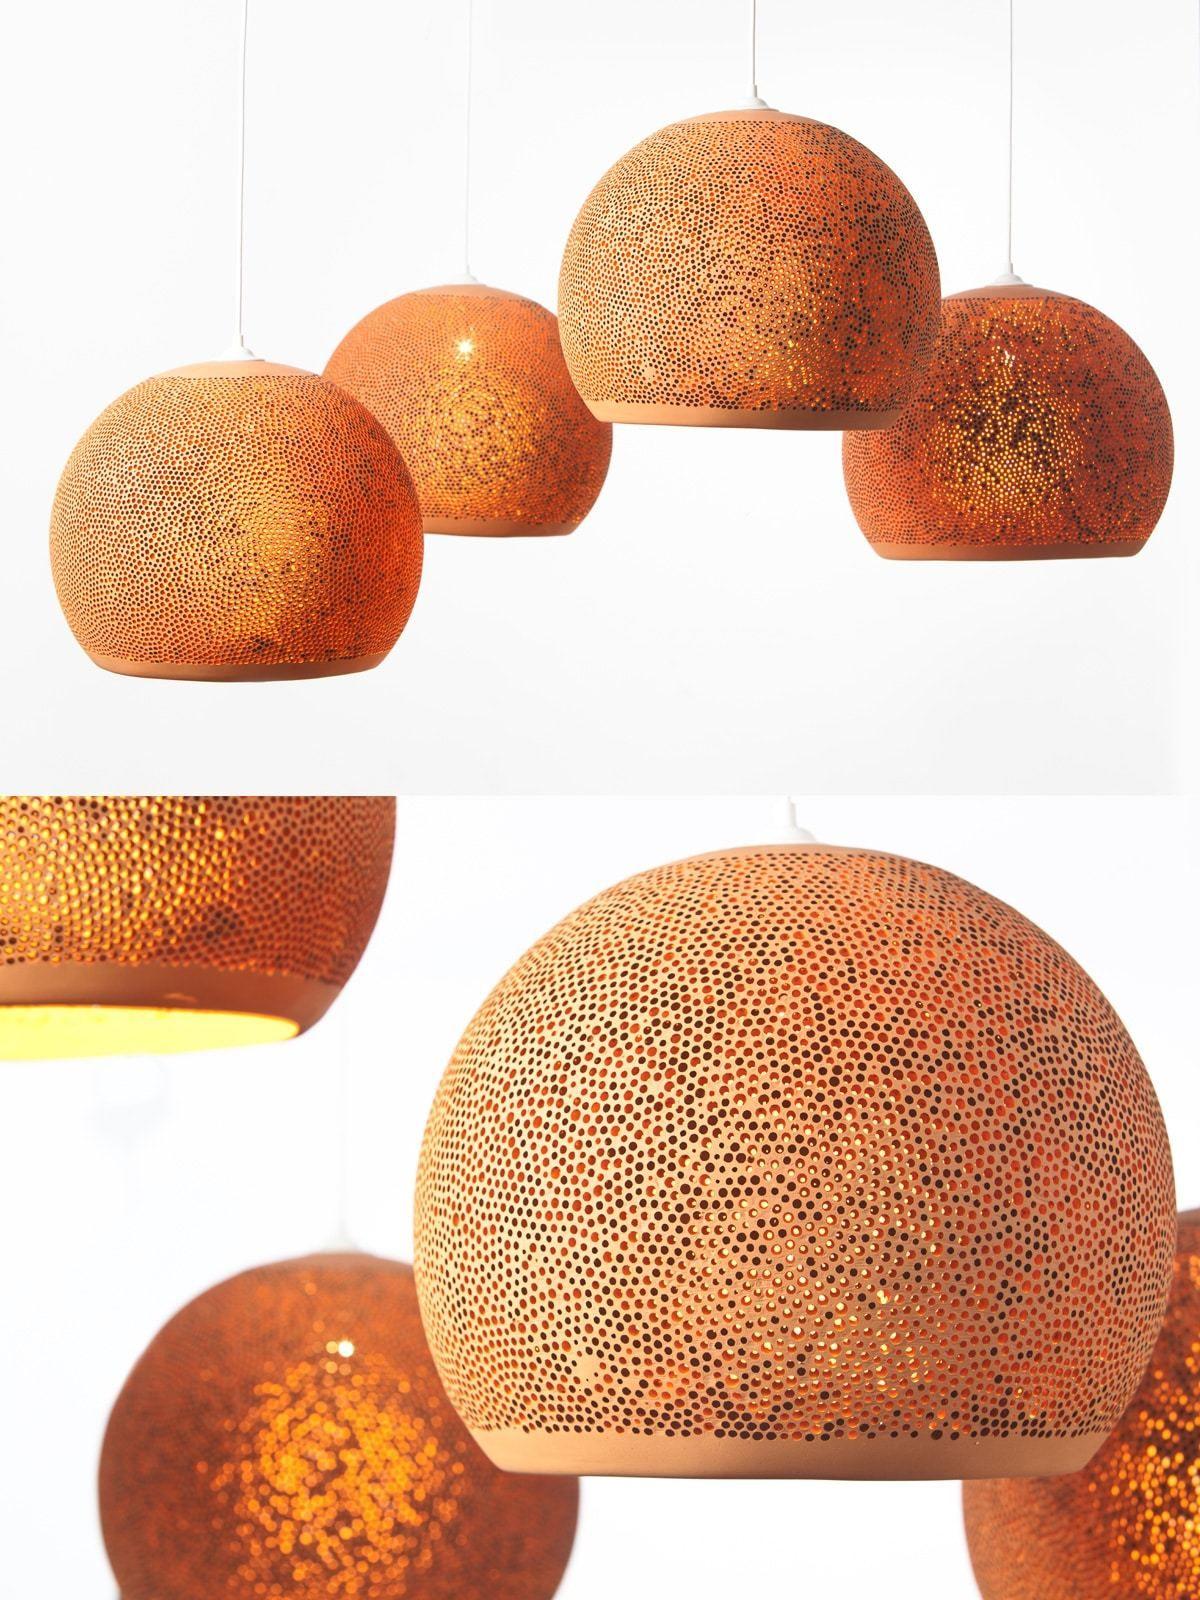 WeißLampen Materials Aus Naturmaterialien Spongeup Natural dhQsrCt